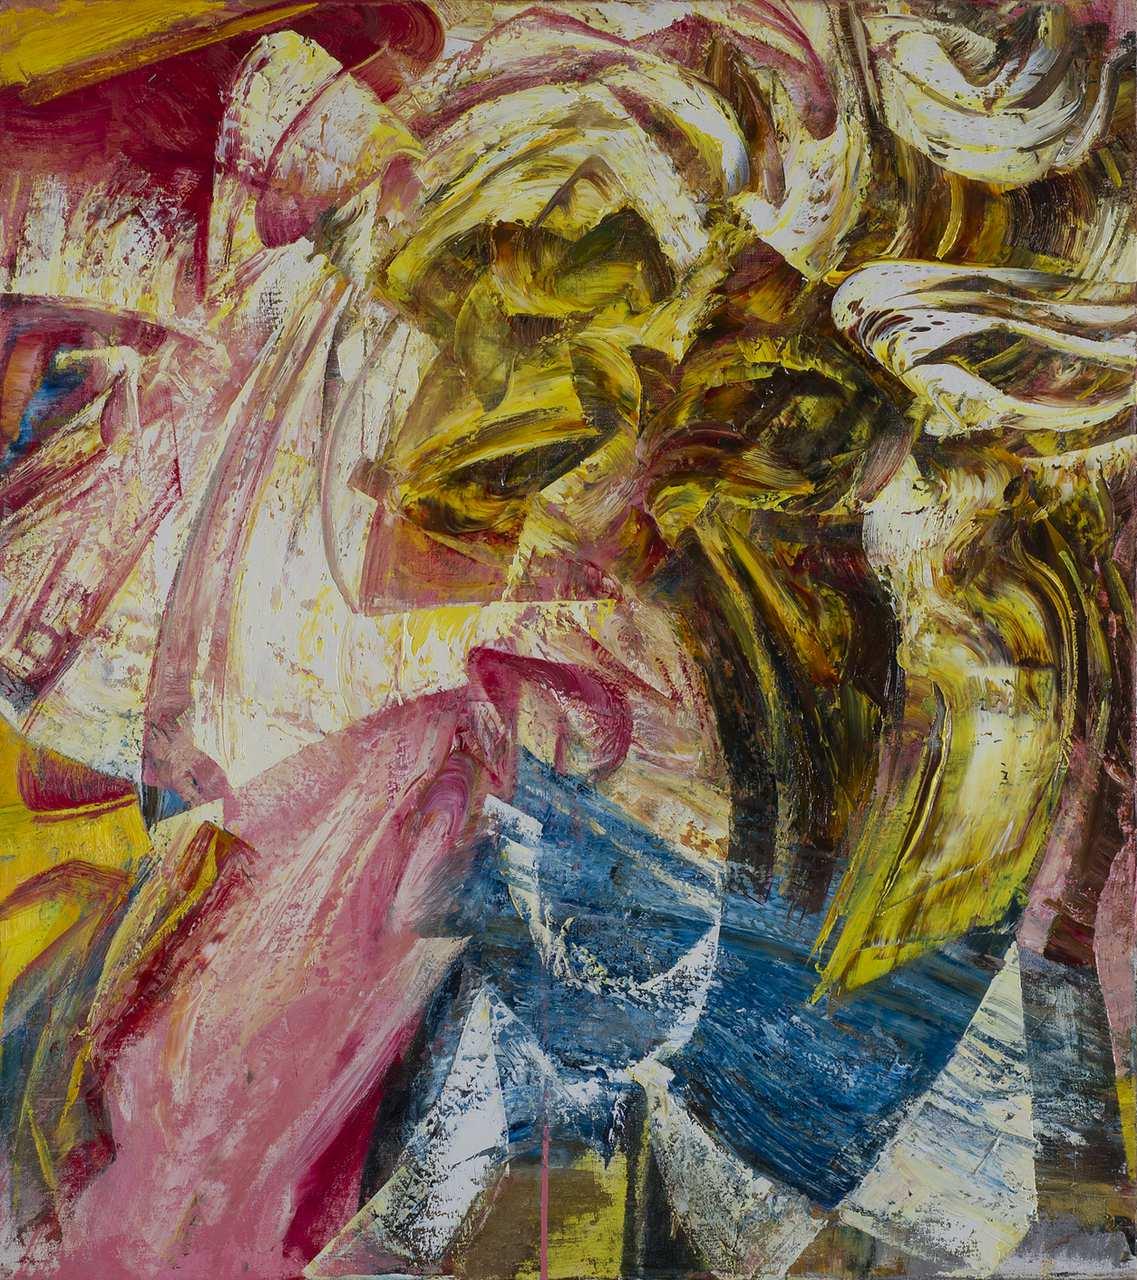 Snuff, oil on canvas, 90 x 100 cm, 2017